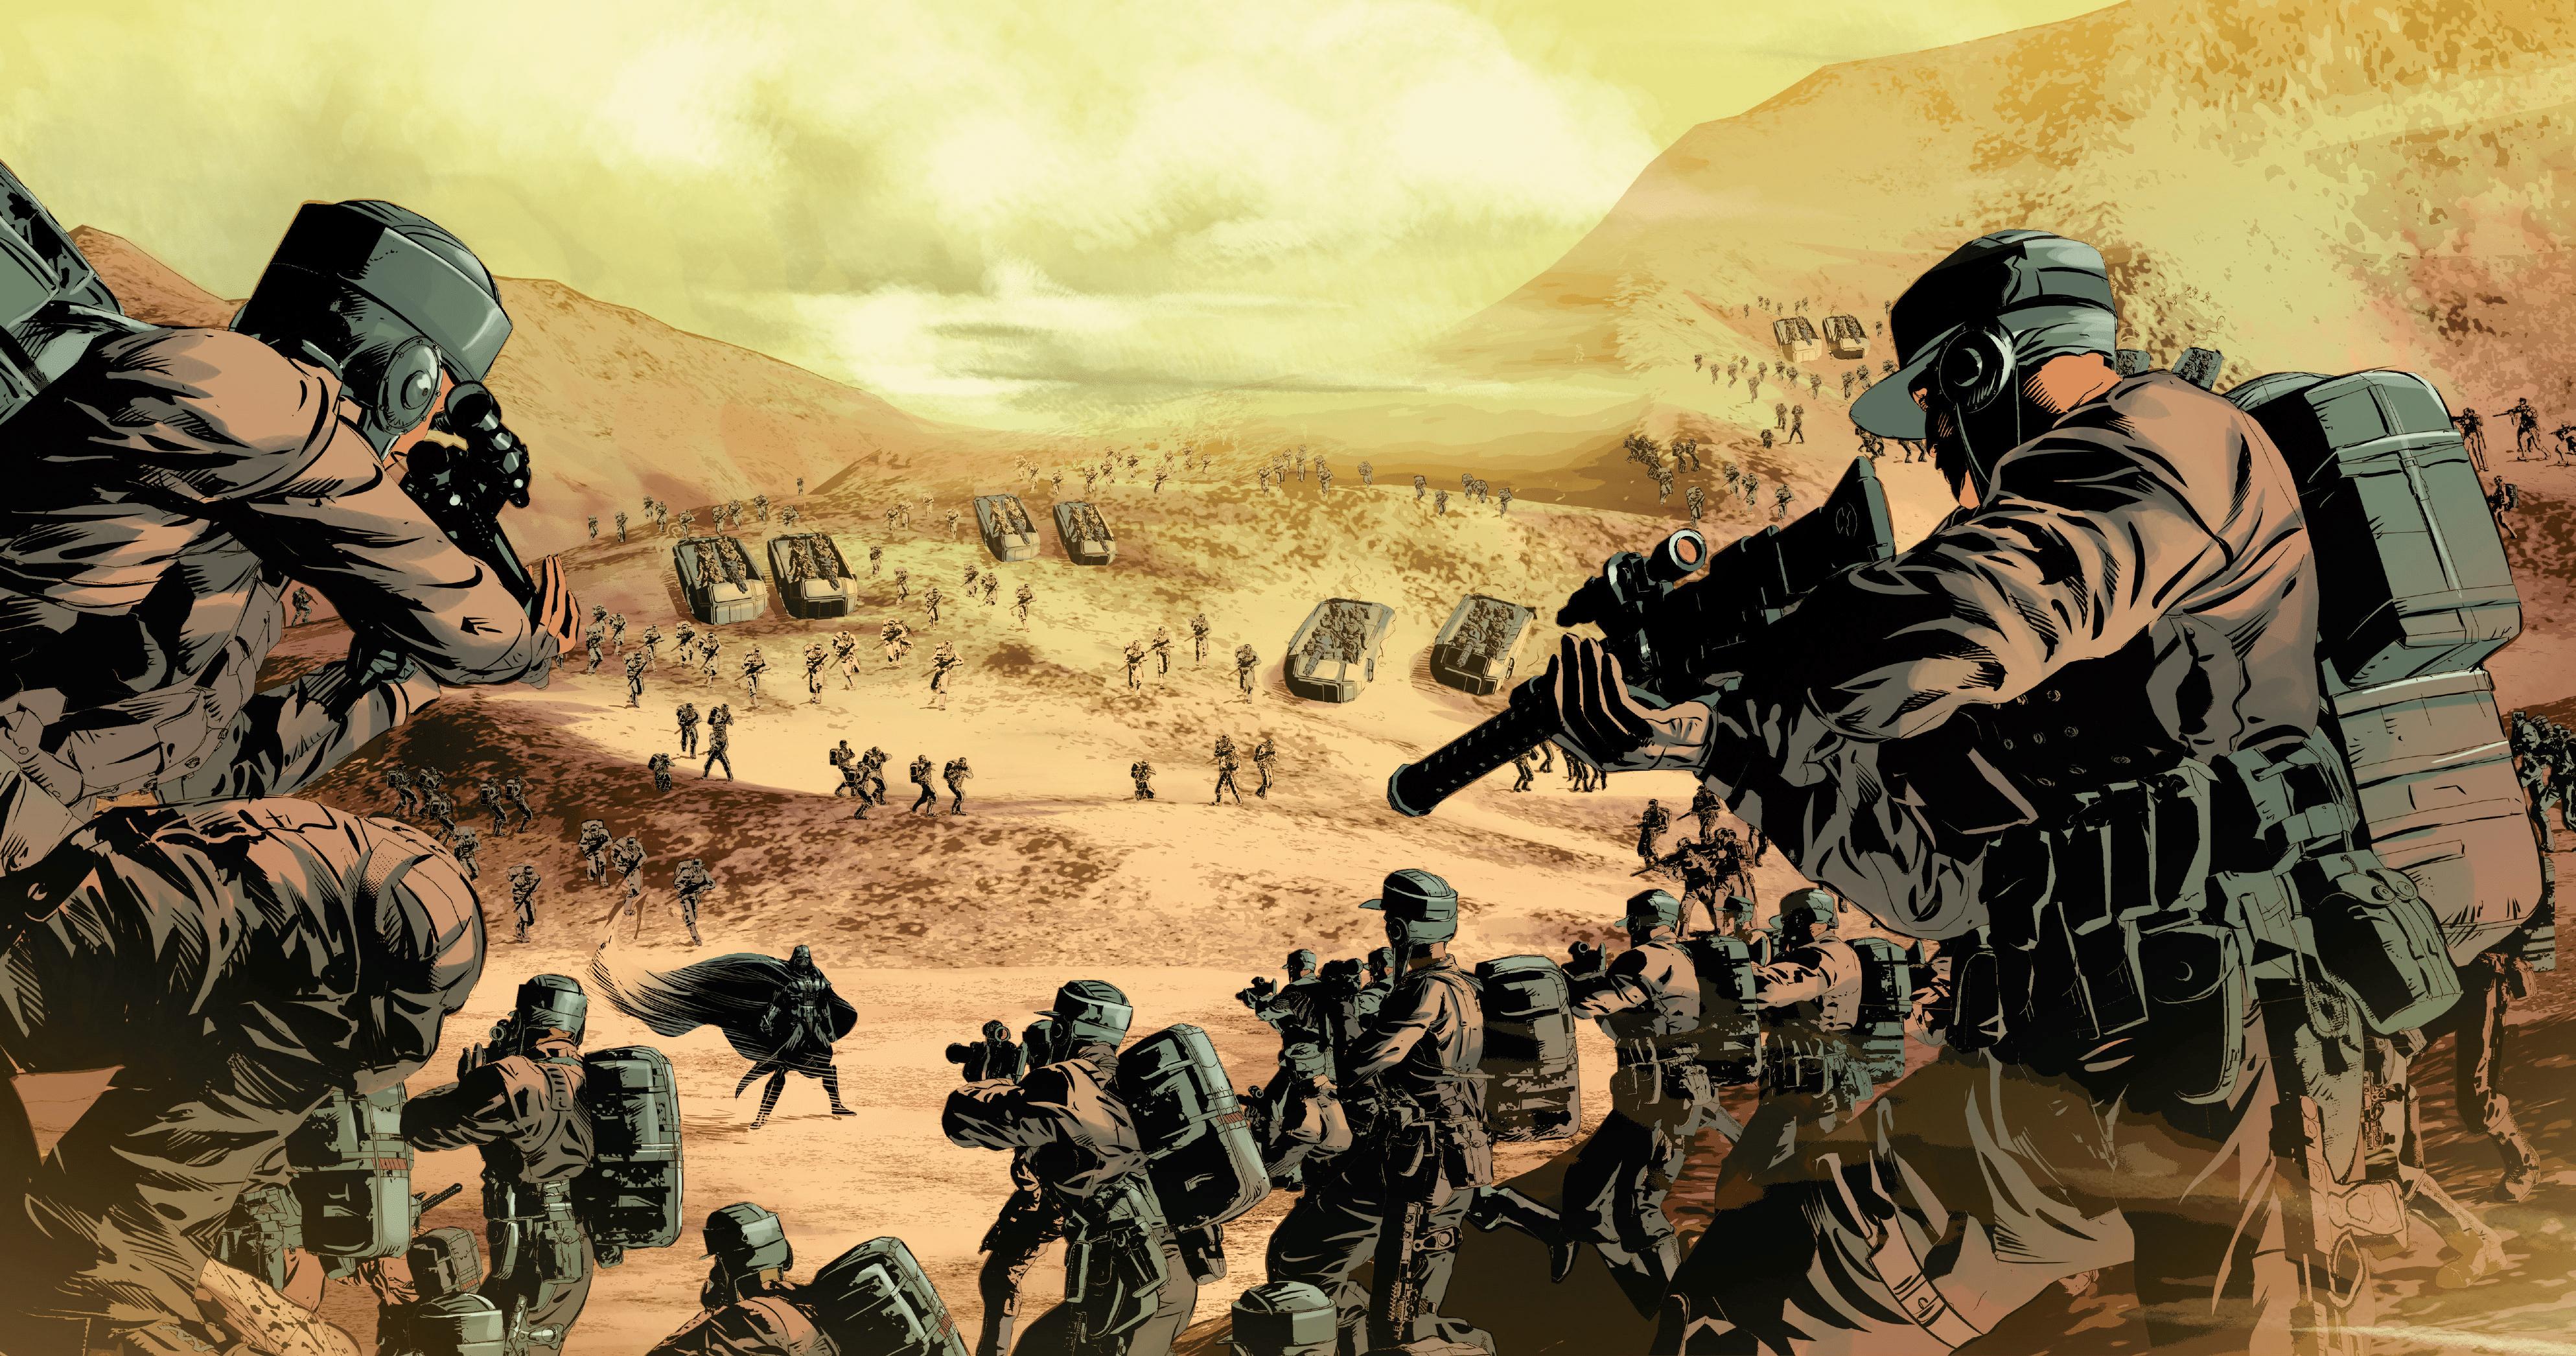 Star Wars Rebel Alliance Wallpapers Top Free Star Wars Rebel Alliance Backgrounds Wallpaperaccess